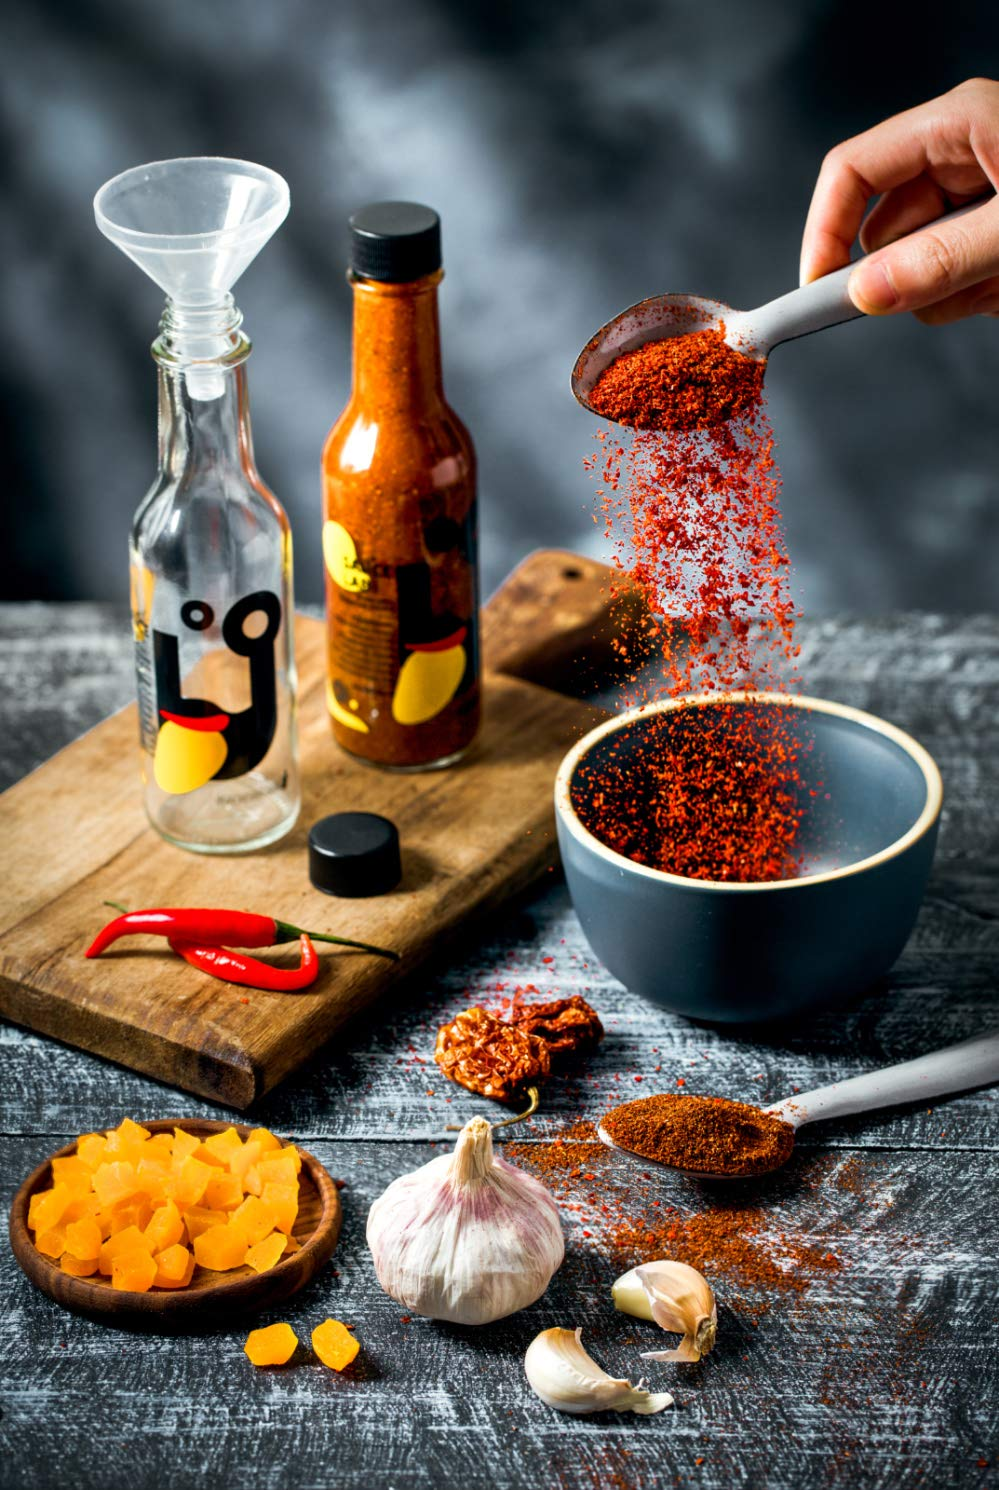 50% OFF FLASH SALE! Sauce Lab Mango Habanero Hot Sauce DIY Kit